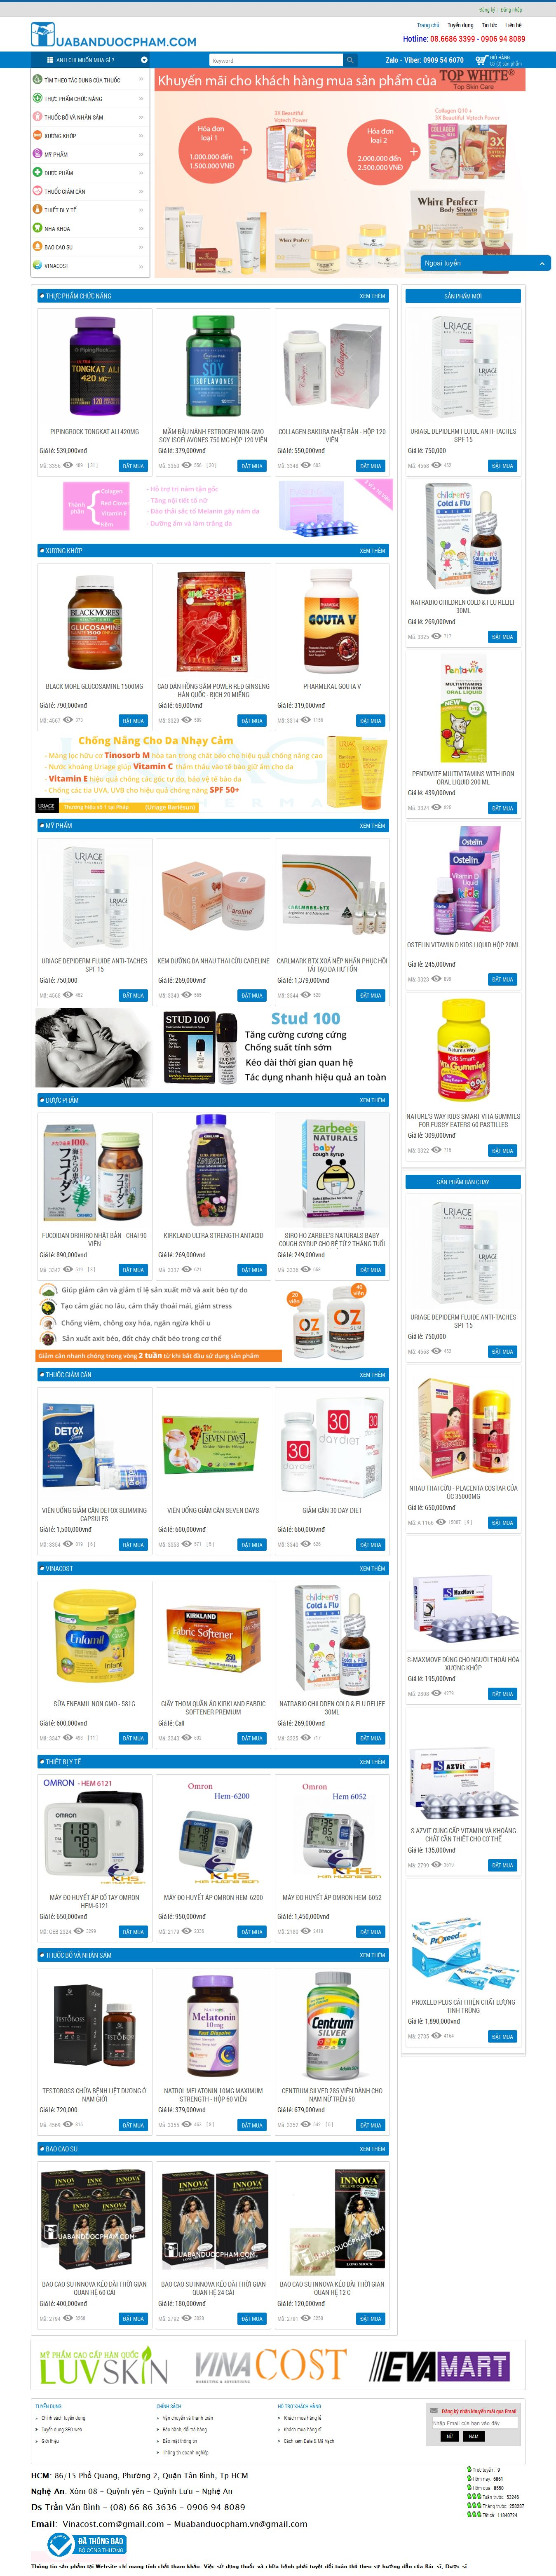 Mẫu website dược phẩm 10507